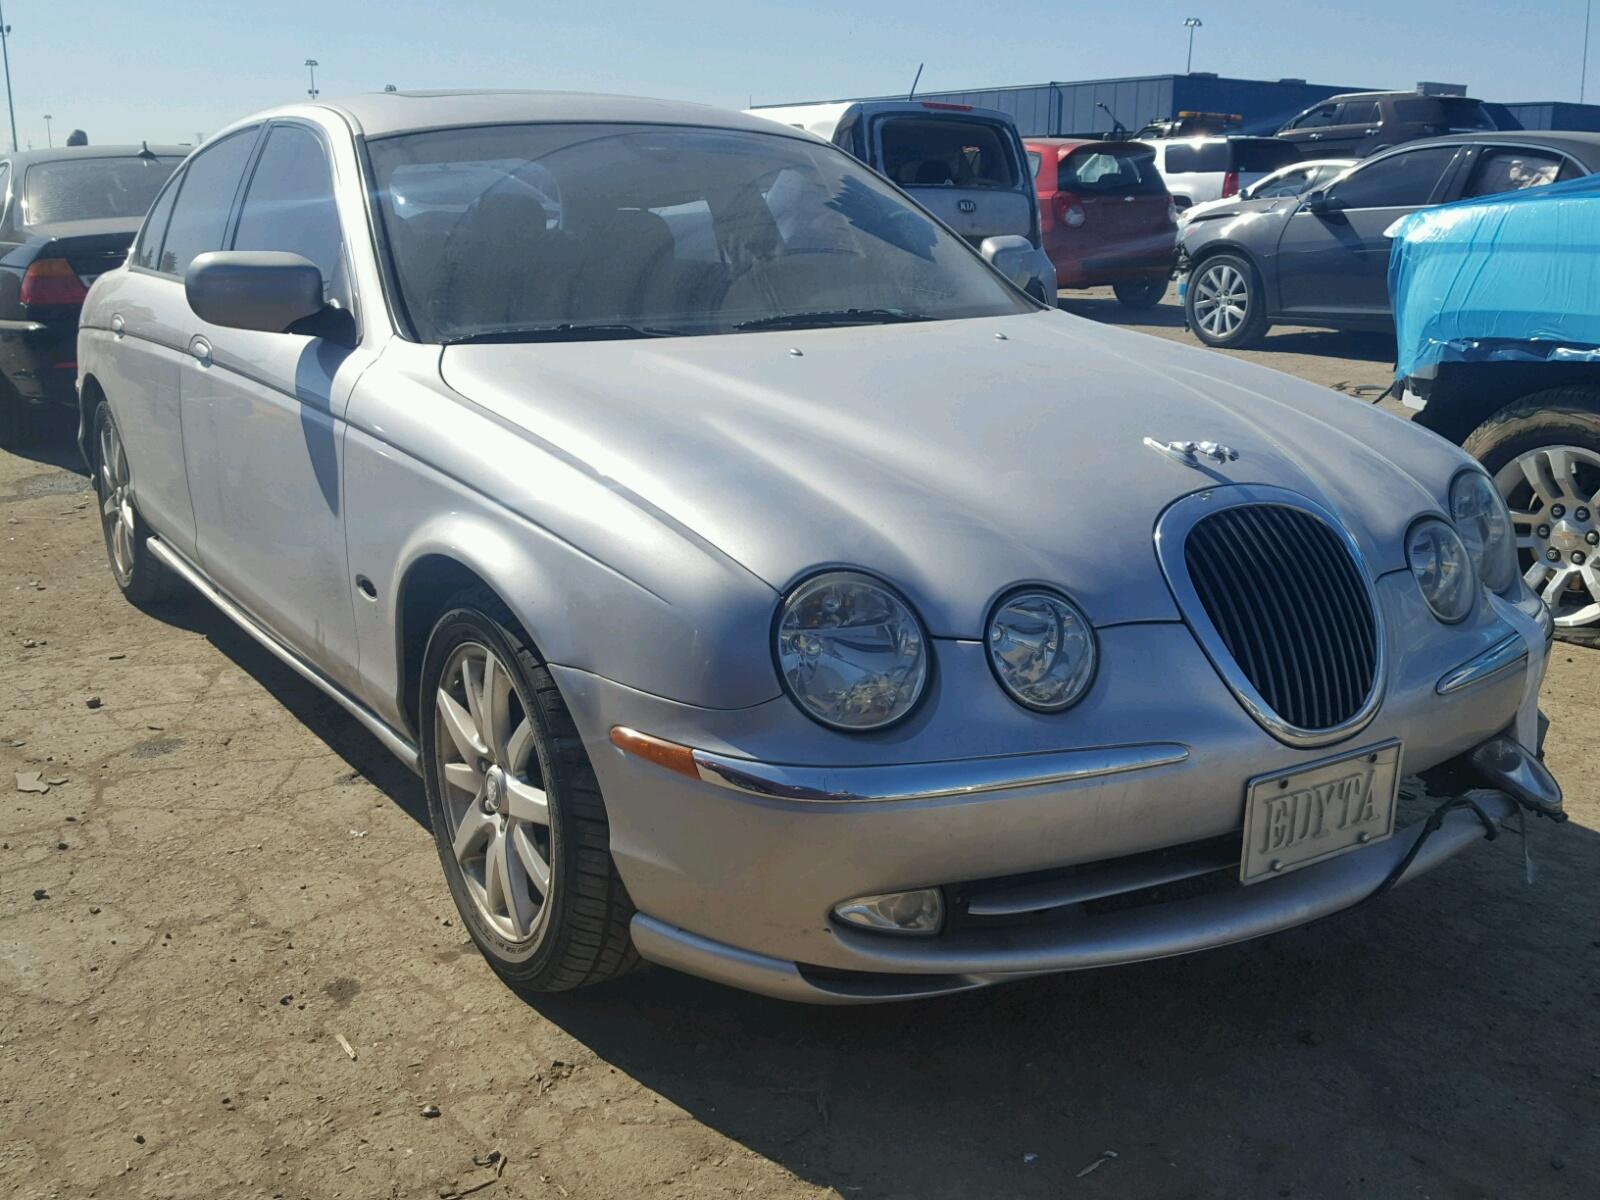 michigan for classics cars sale car s near jaguar type modern cadillac classic